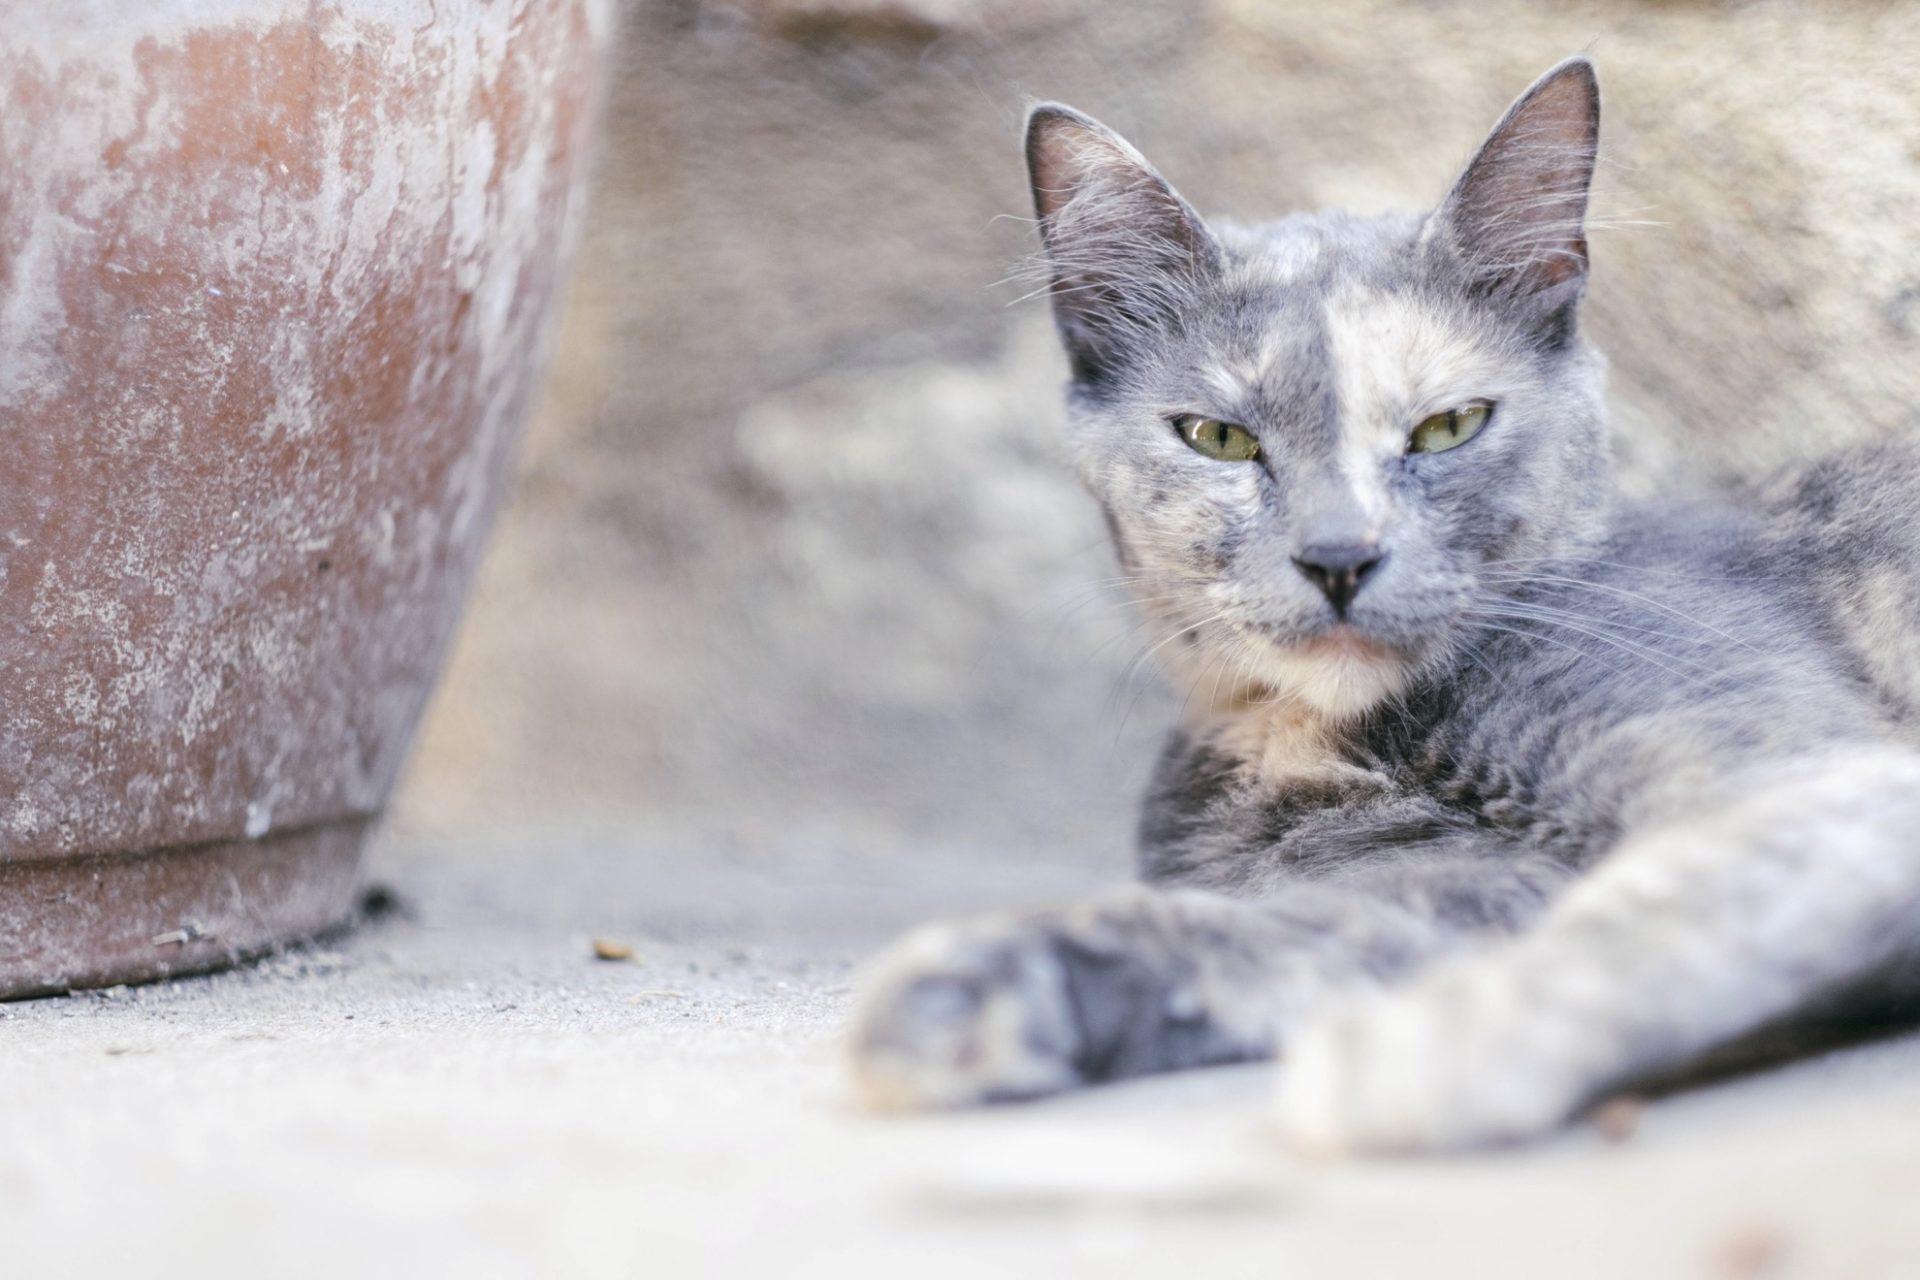 chats grecs@laurentparienti - 3